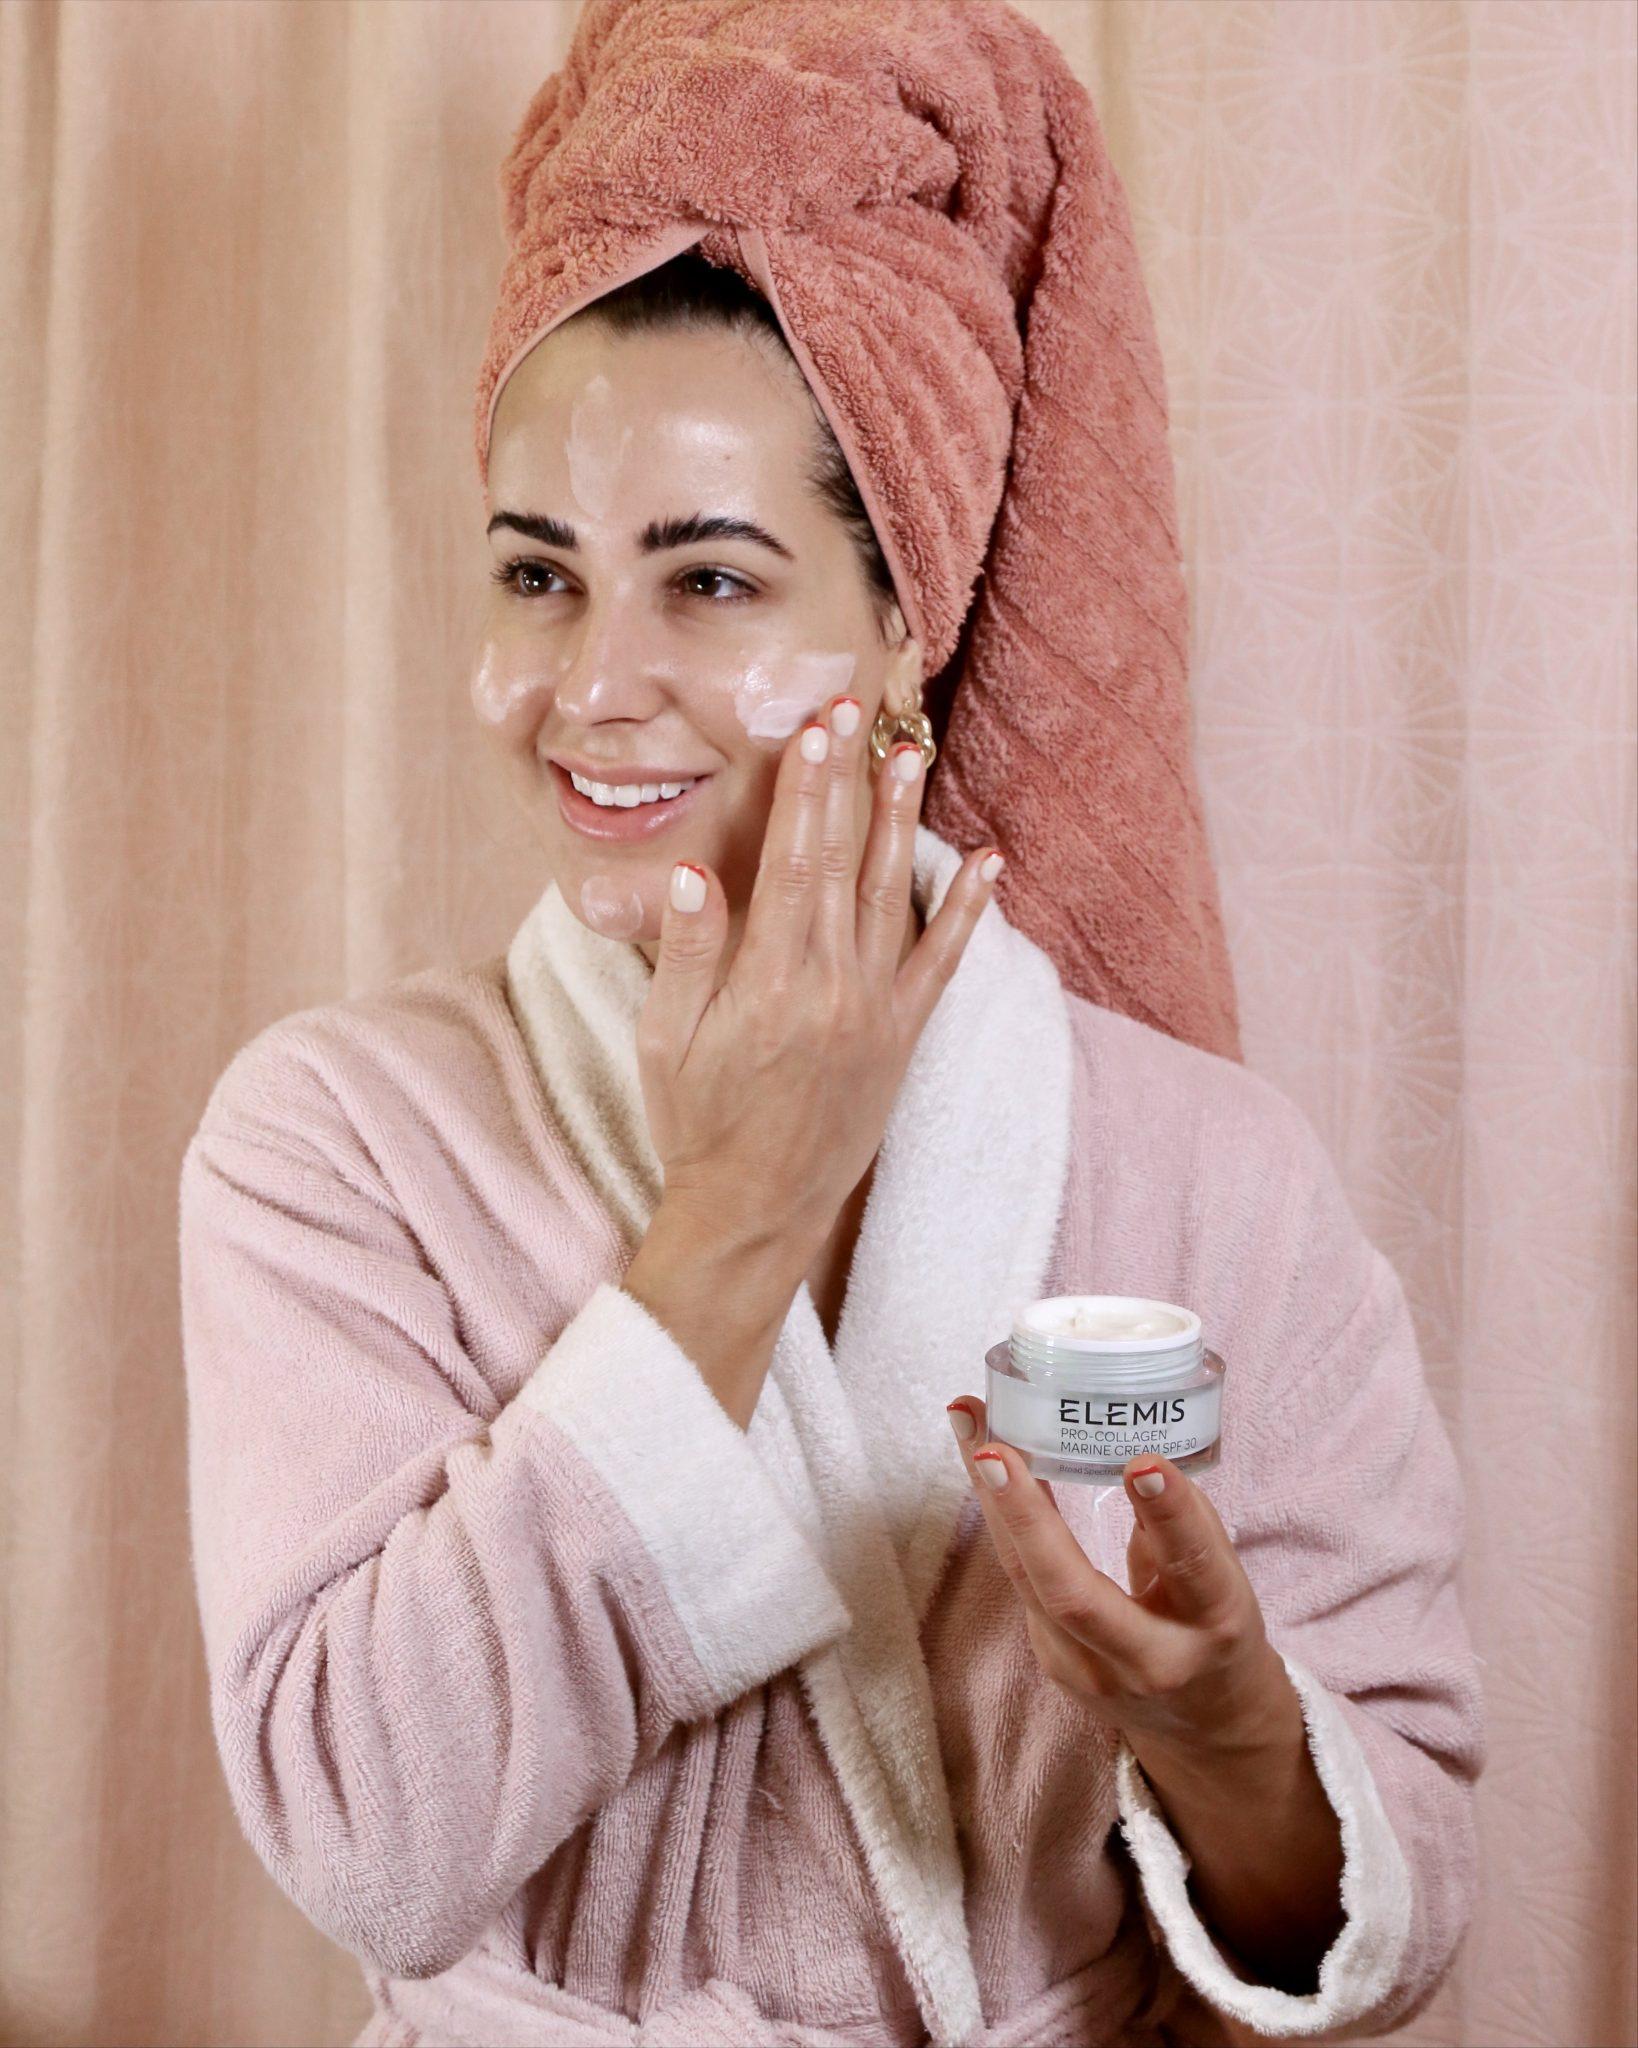 kelly saks uses elemis marine cream as part of her winter skincare routine